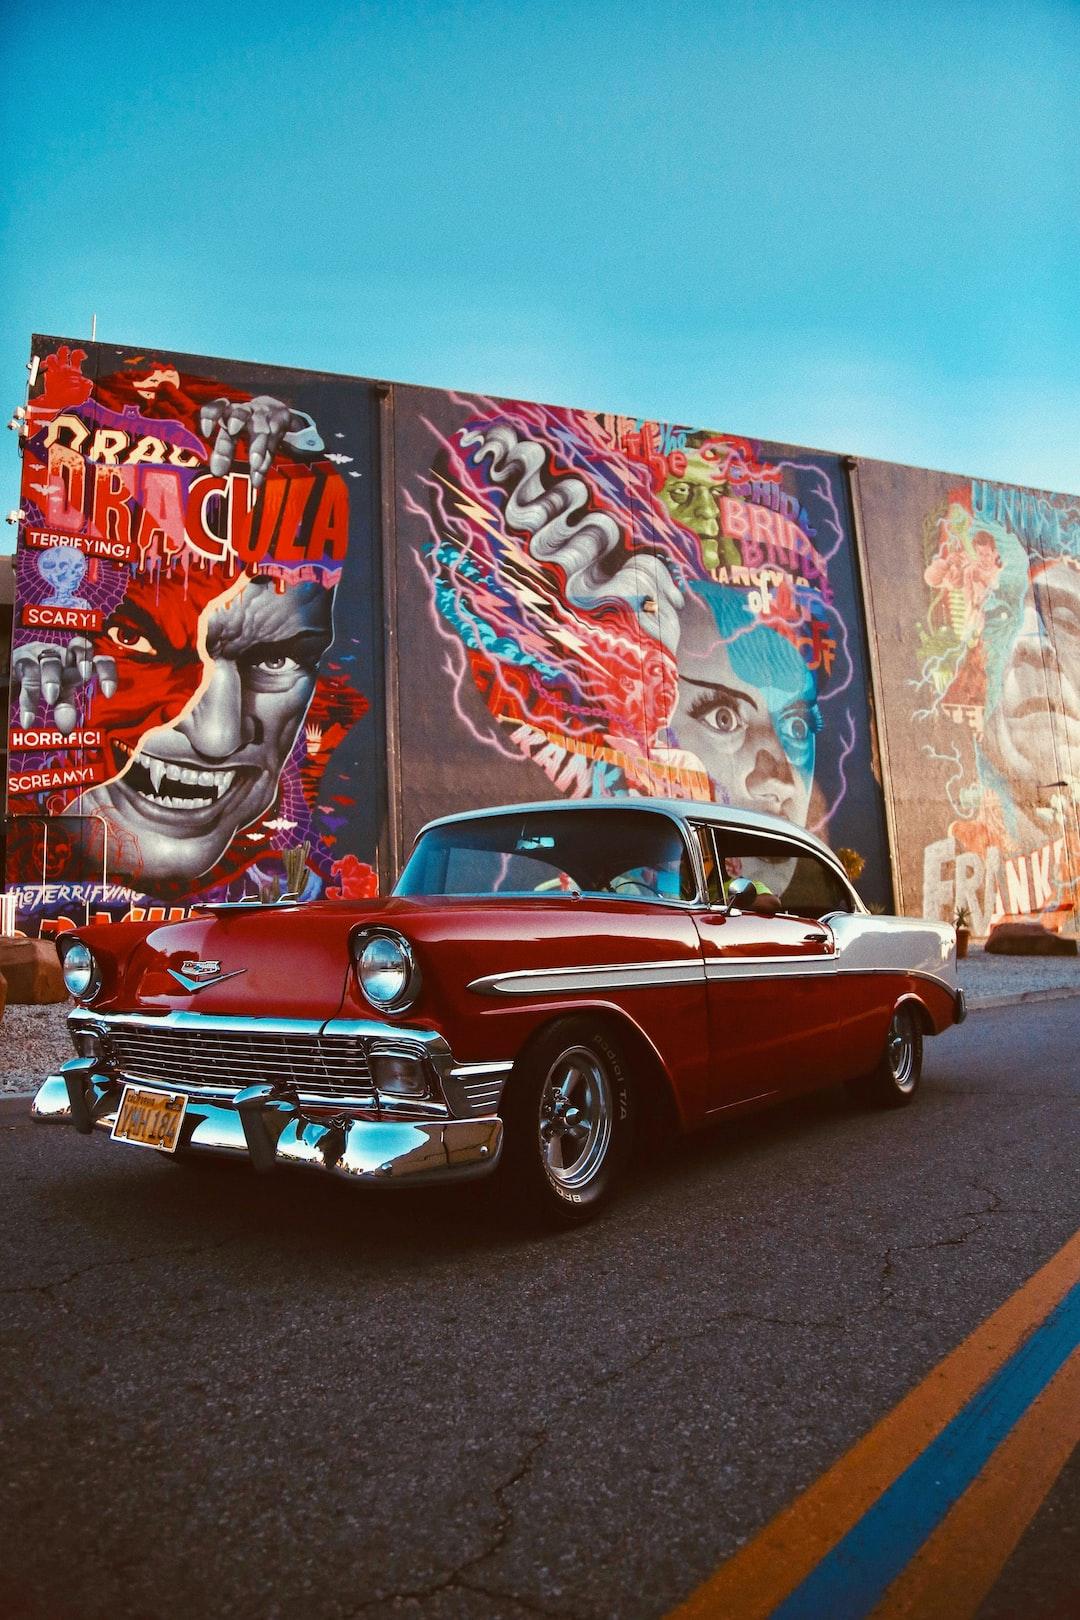 1956 Chevy Bel Air x @ Universal Studio Backlots - Mural by Tristan Easton